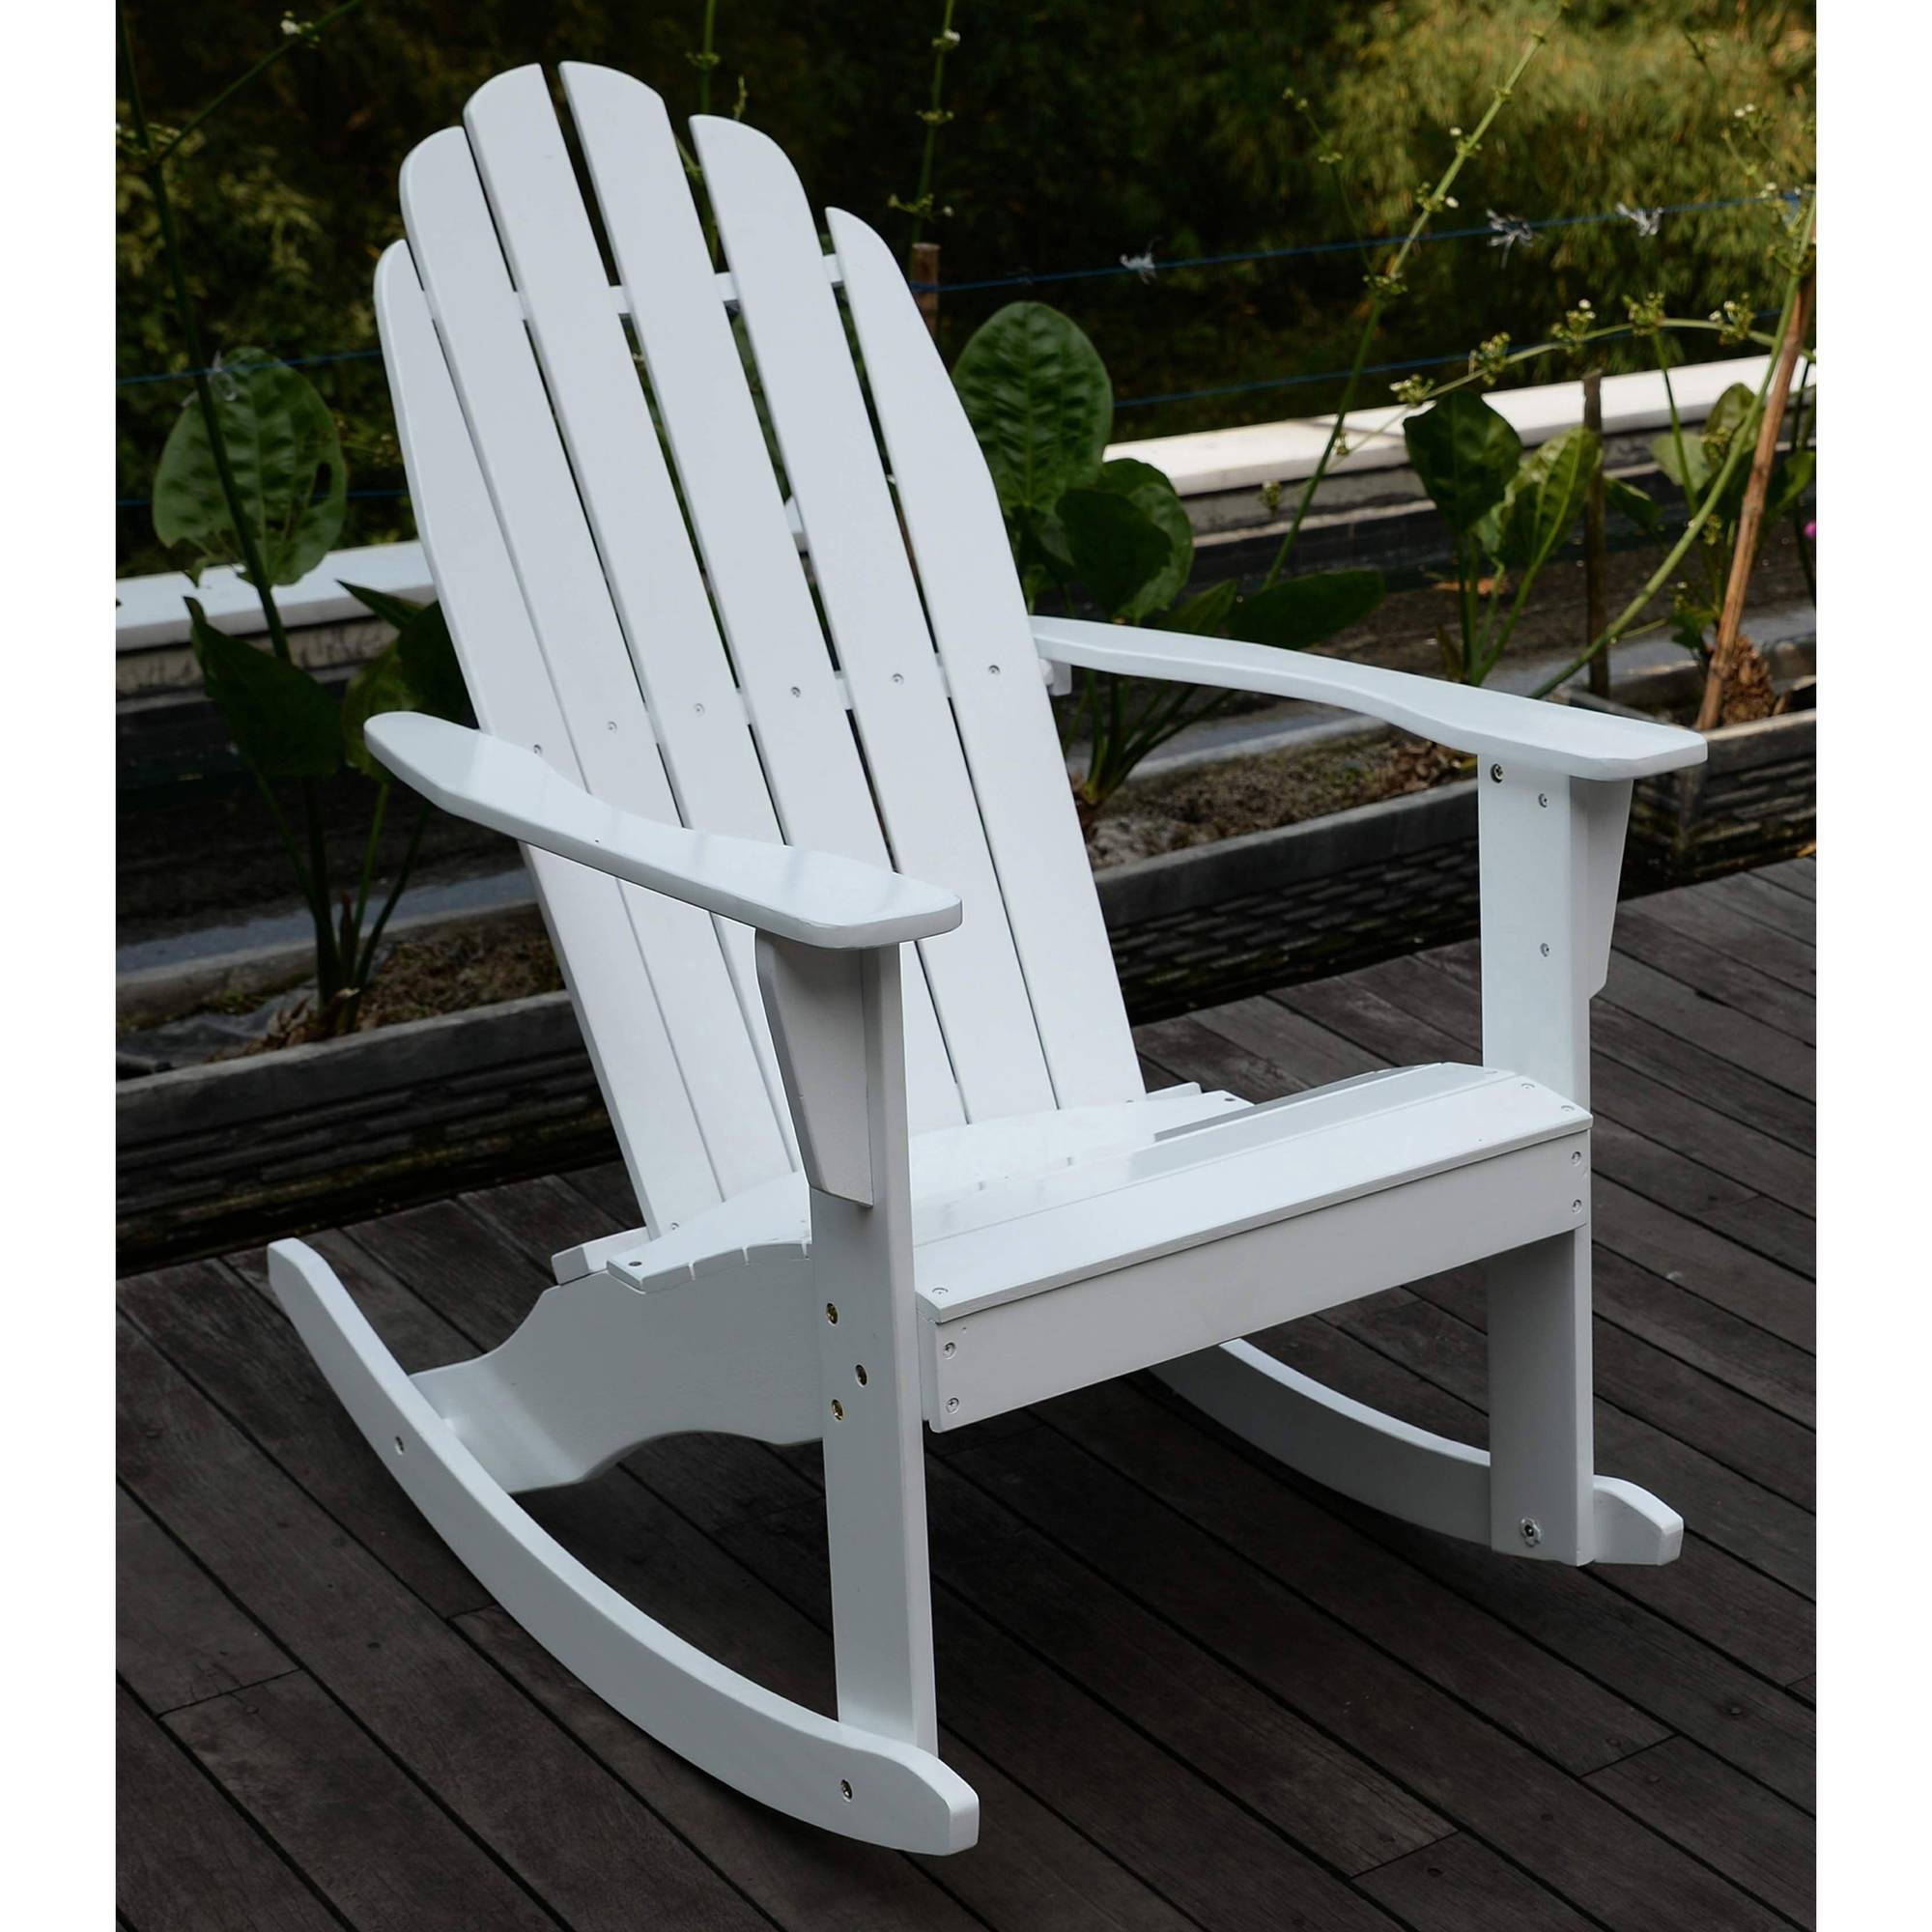 Adirondack Rocking Chair, White – Walmart With Walmart Rocking Chairs (View 7 of 15)